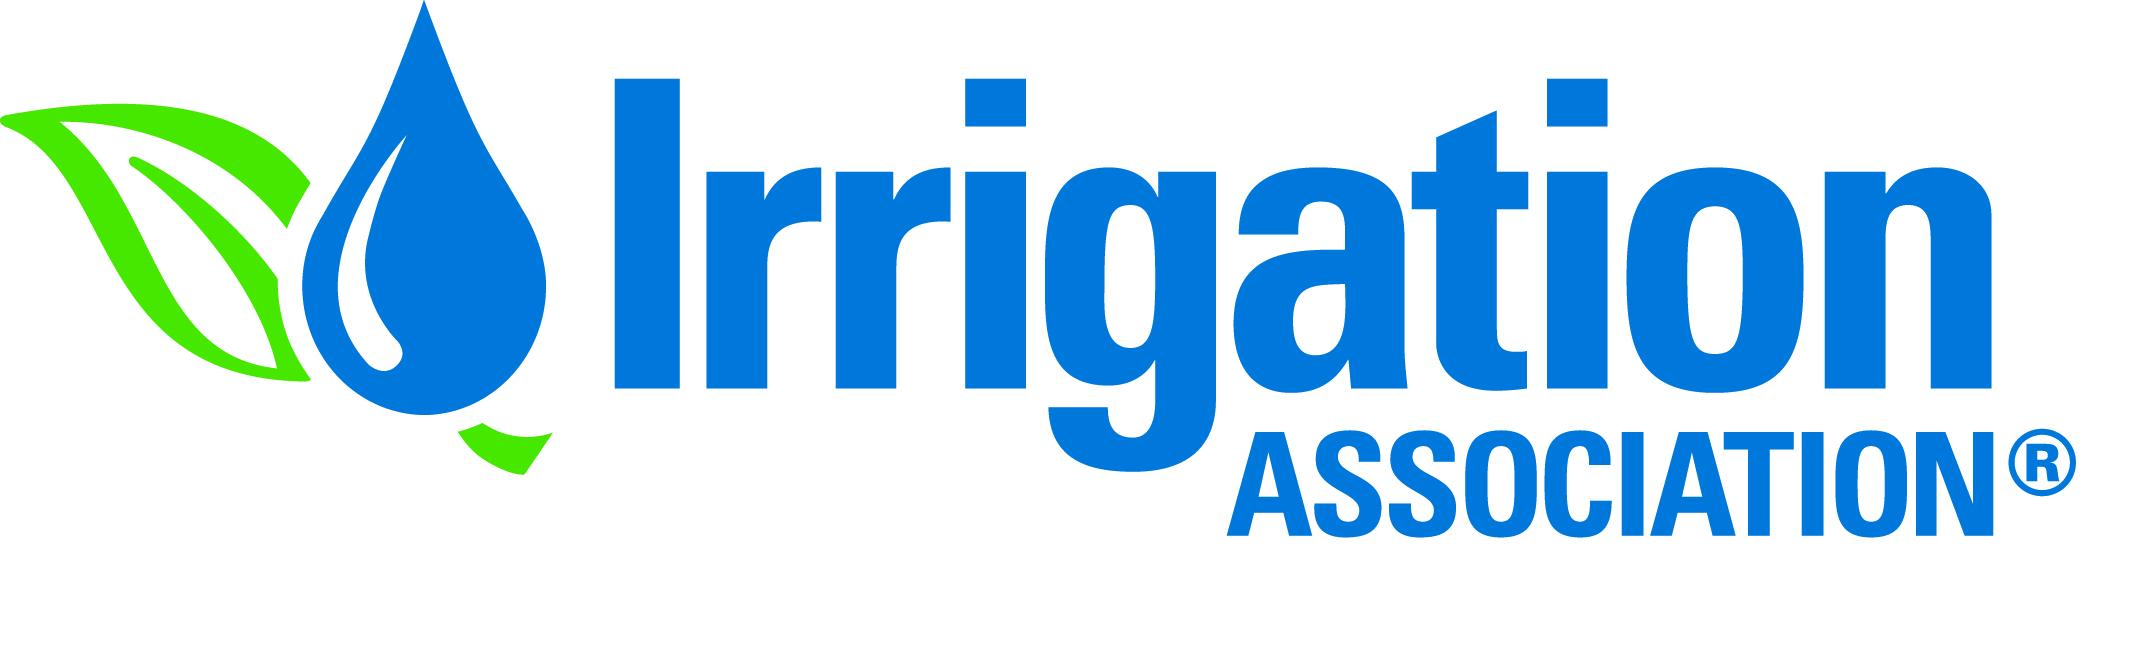 IA-Logo_CMYK_JPG